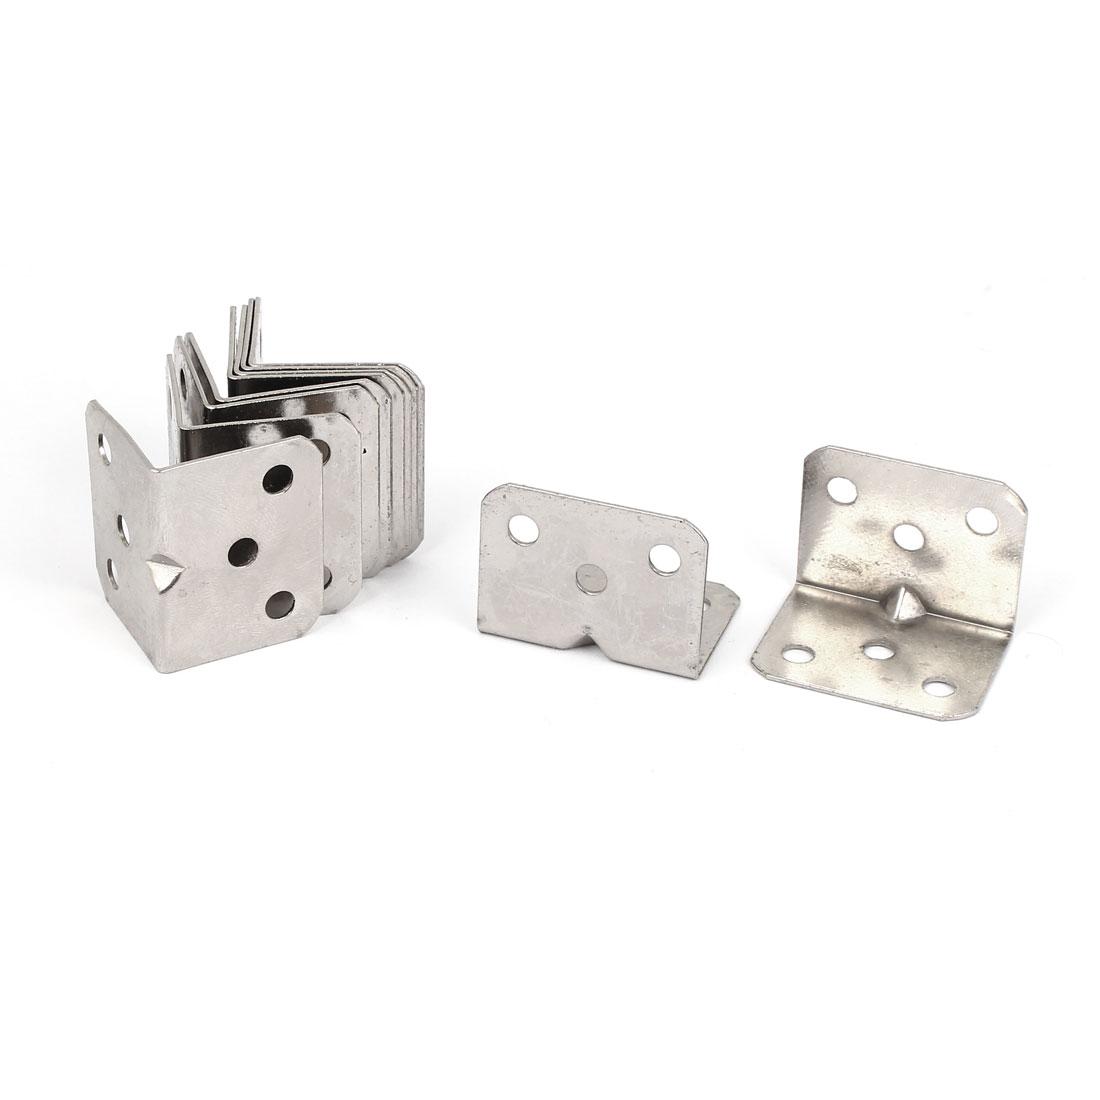 10pcs 27x27x36mm Stainless Steel Corner Brace Right Angle Bracket 1mm Thickness